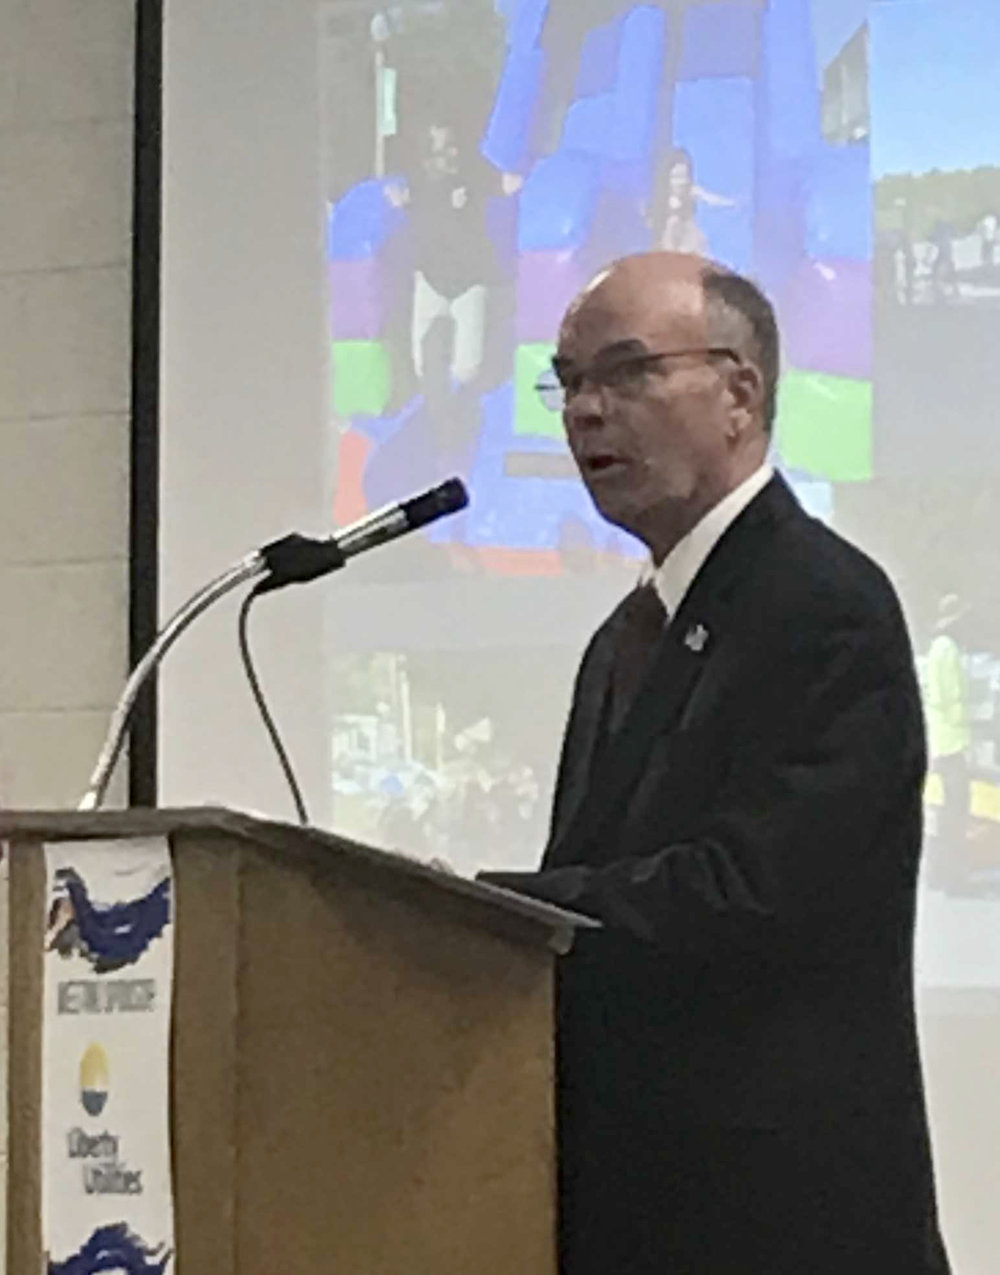 Platte City mayor Frank Offutt